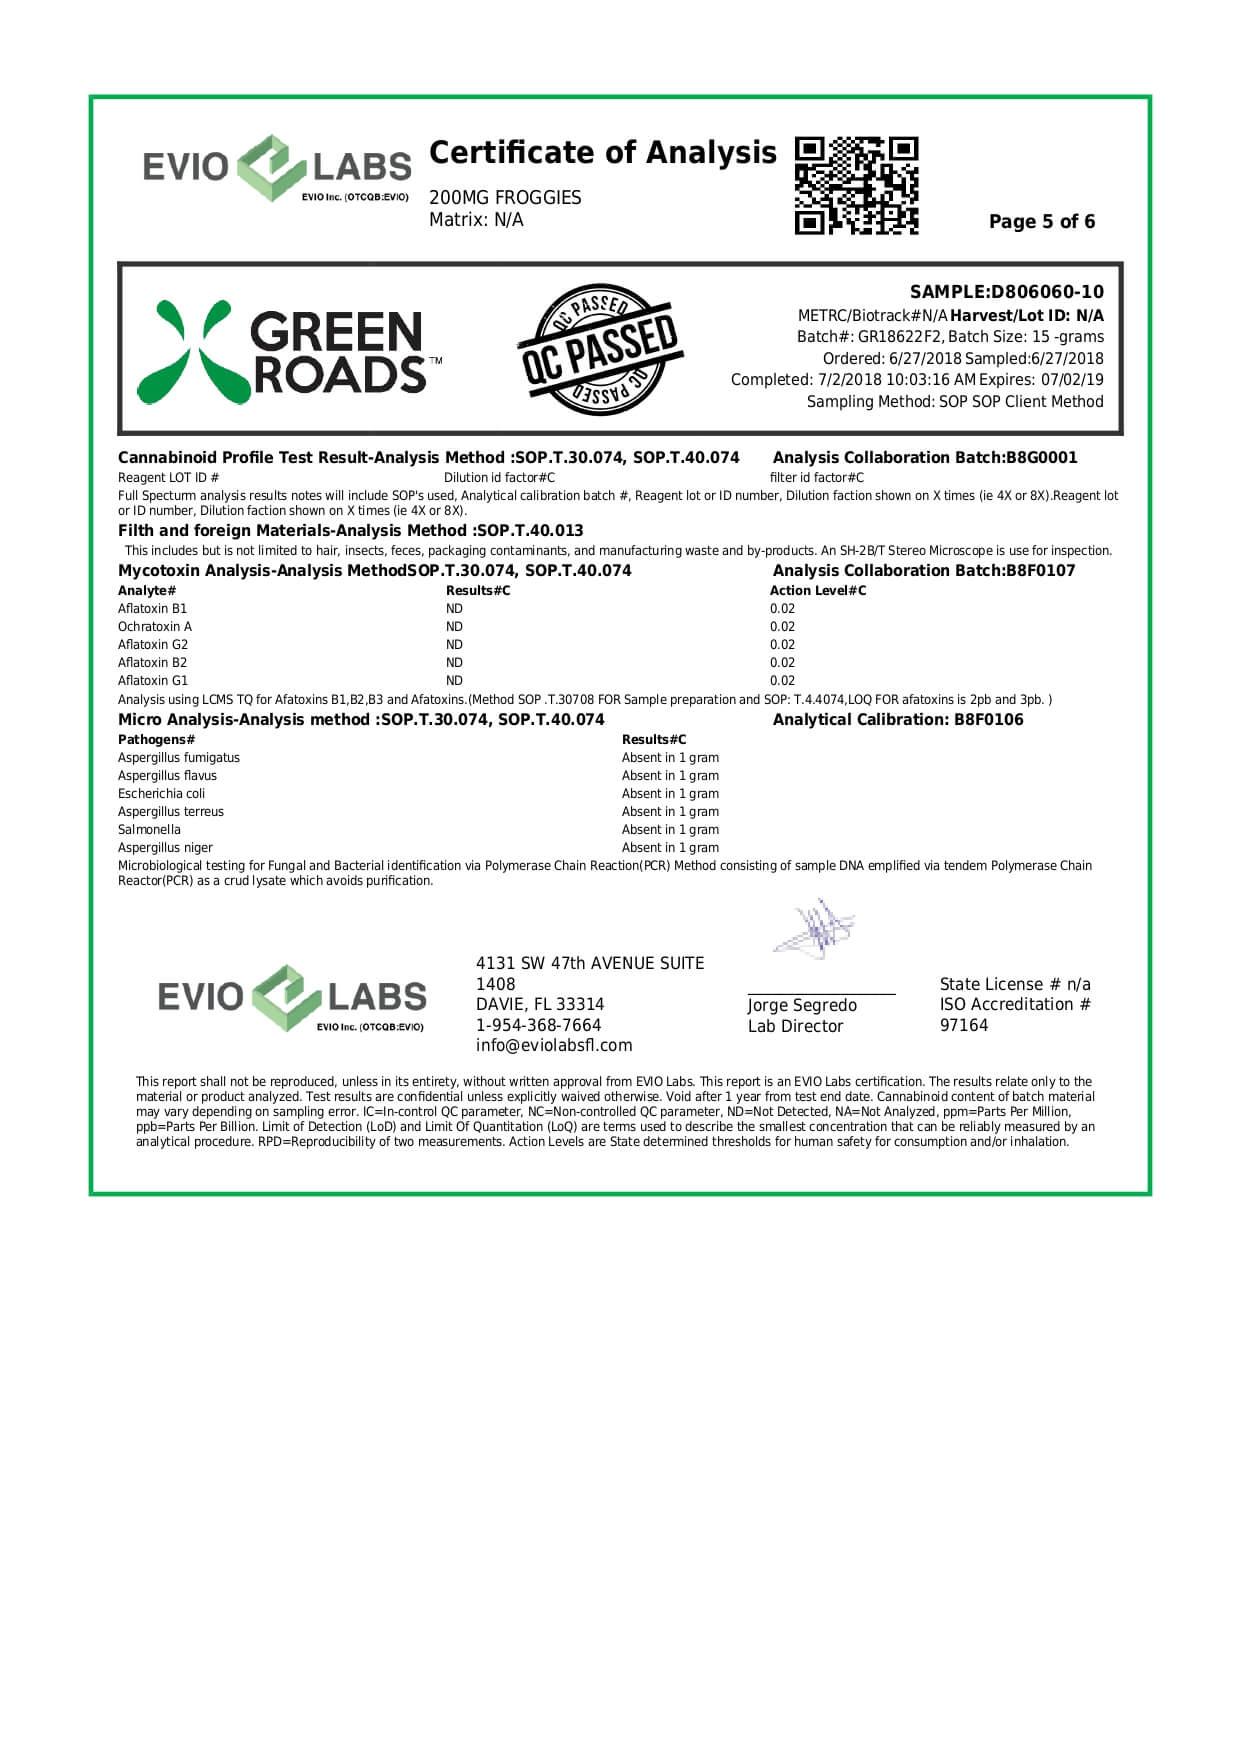 Green Roads CBD Edible Froggies 200mg Lab Report